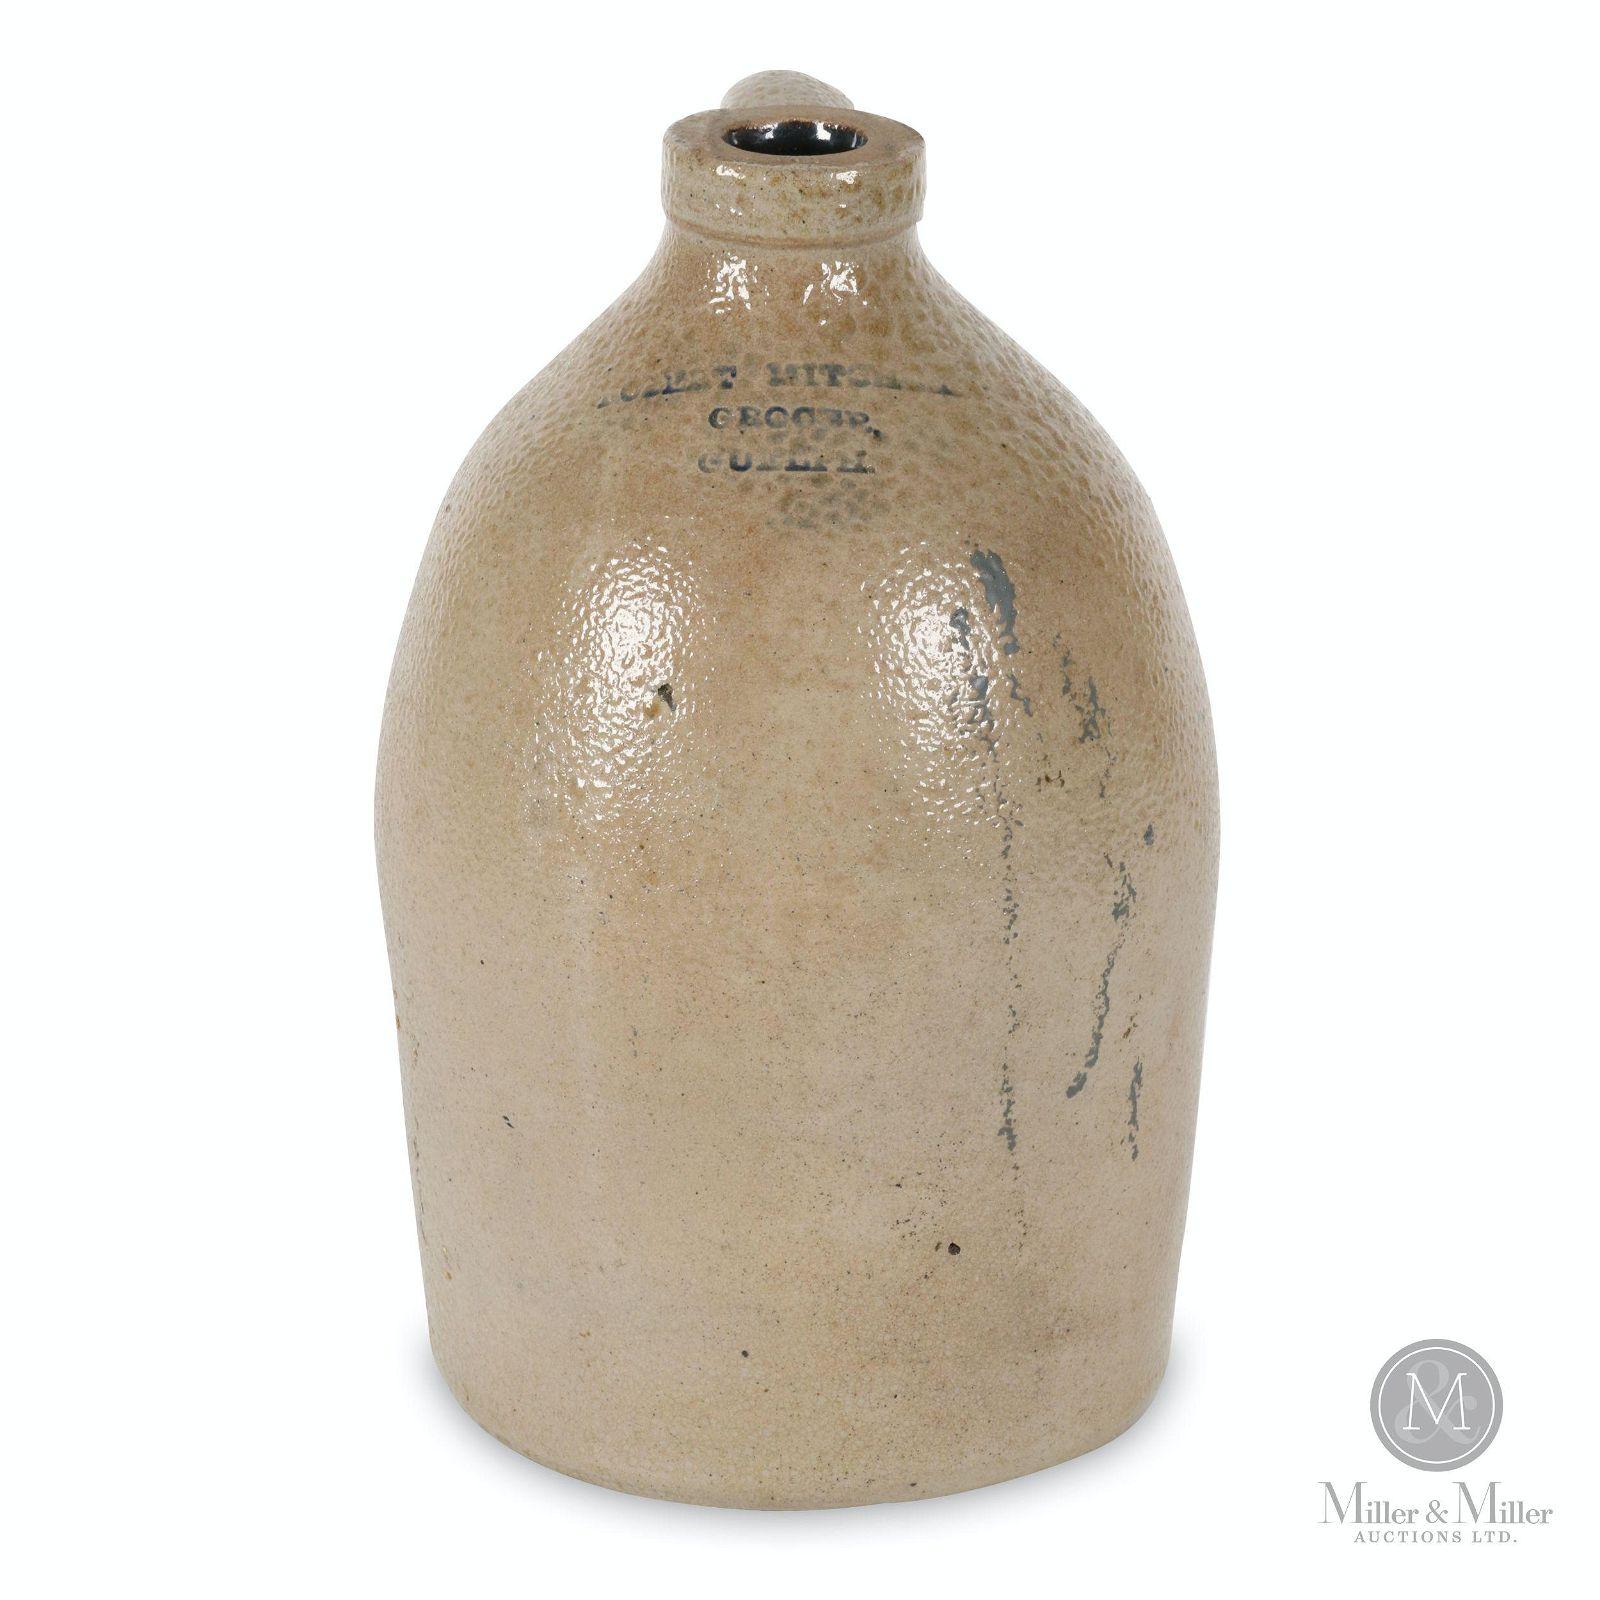 Guelph 1/2 Gallon Merchant Jug